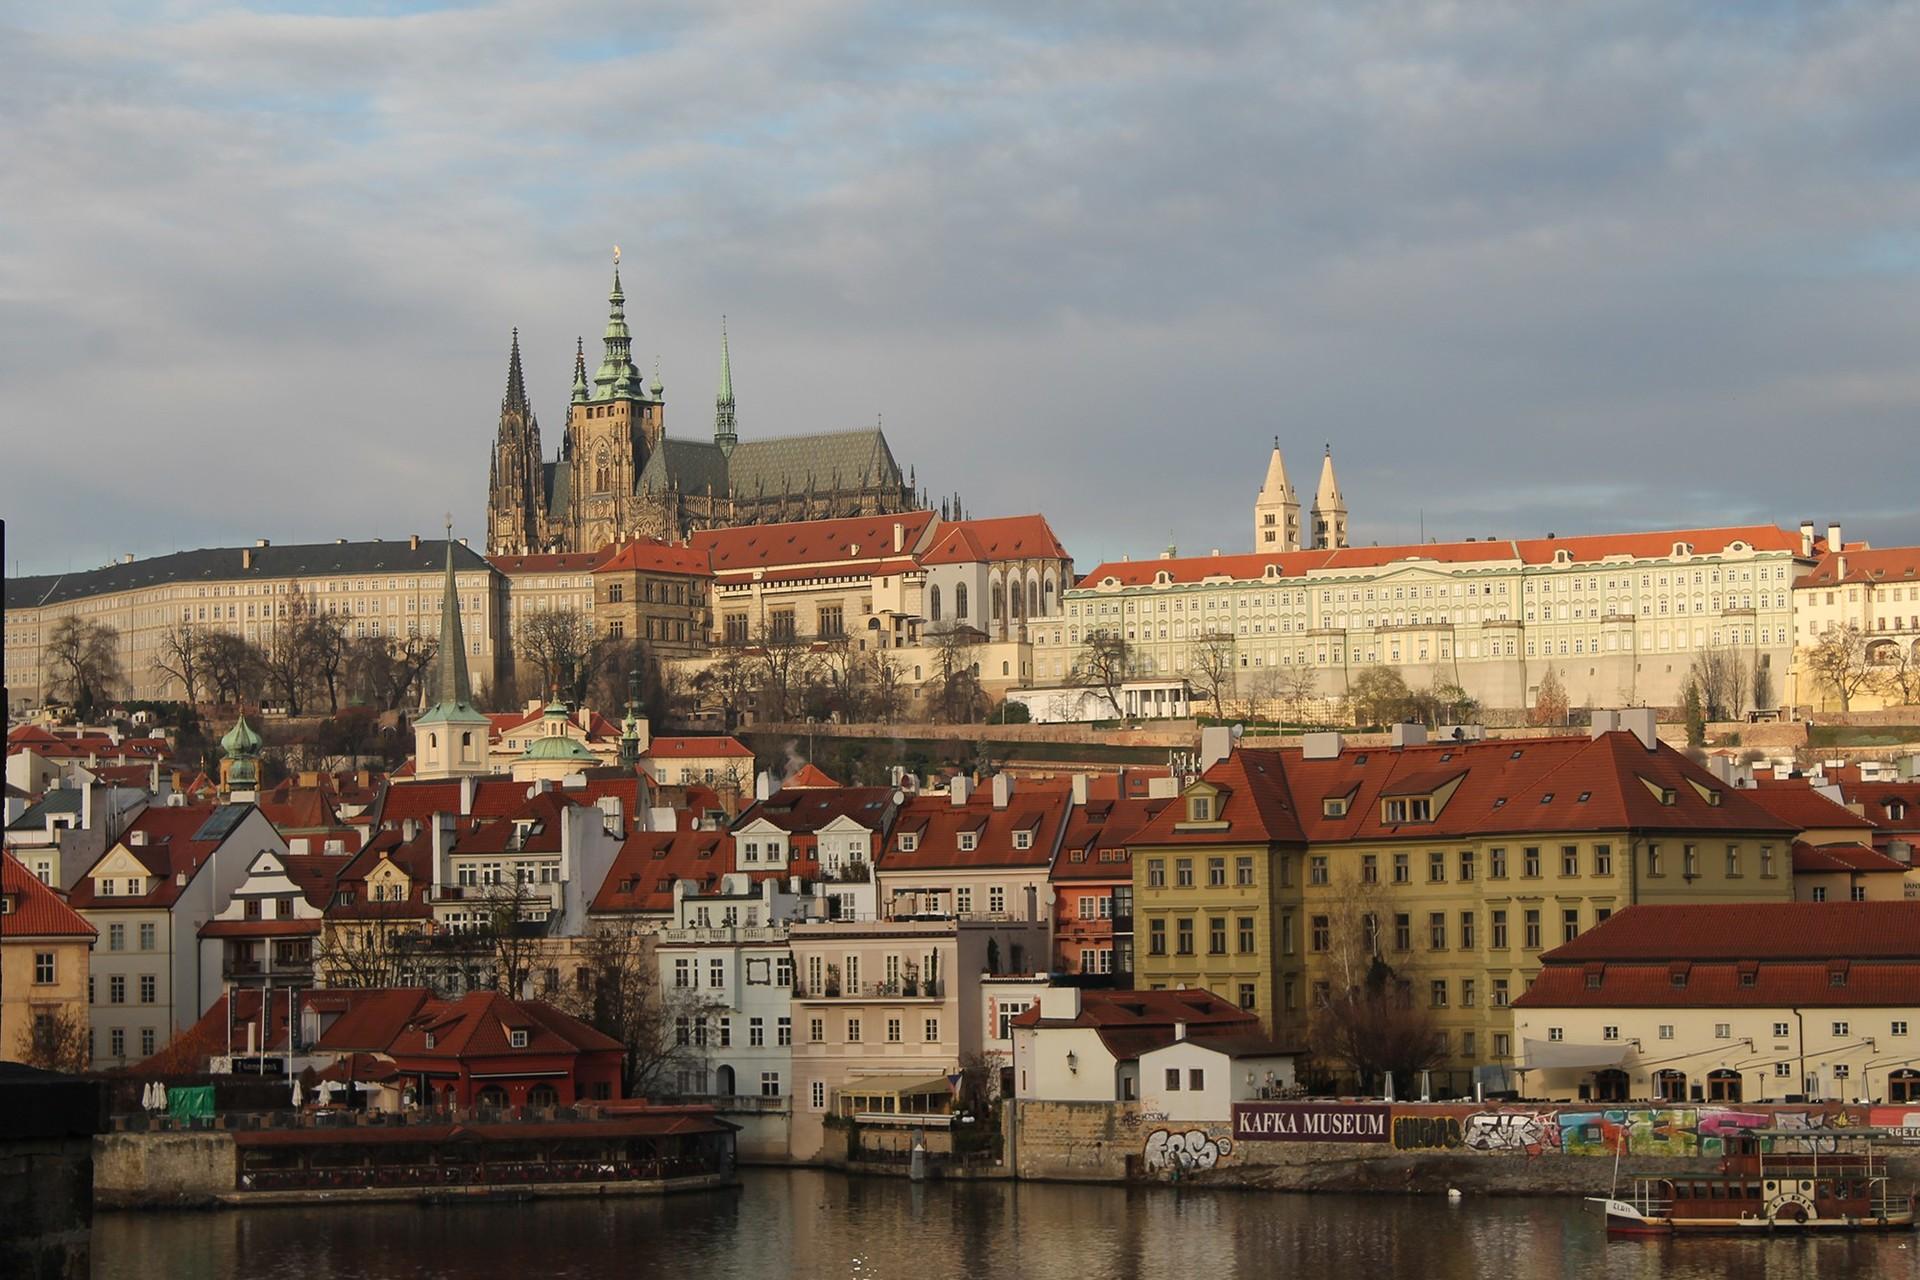 Esperienza all'Università Carlo IV di Praga, Repubblica Ceca di Jan